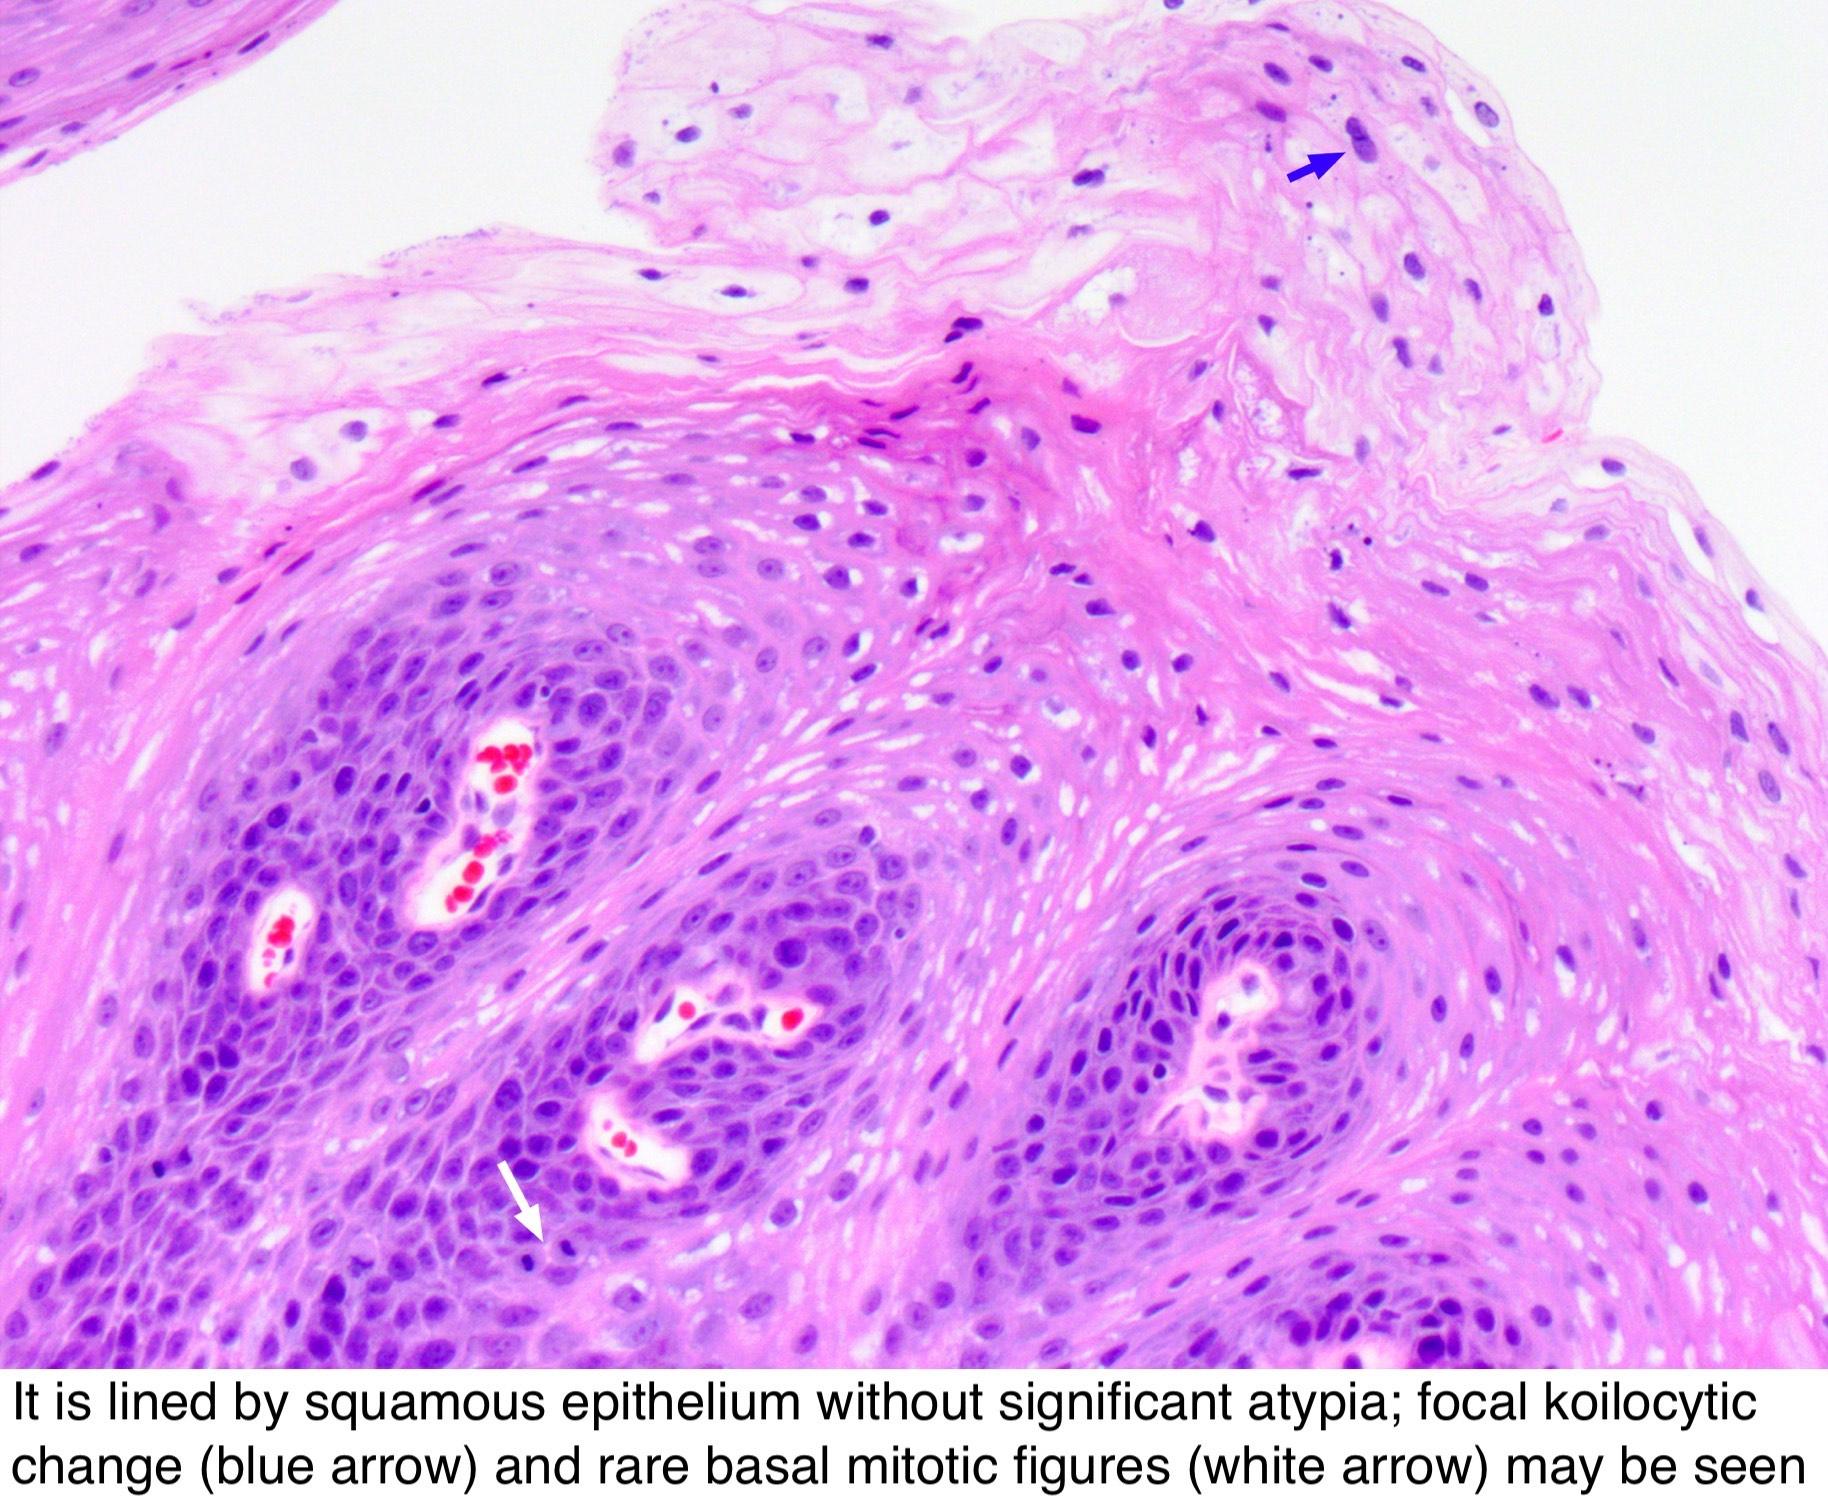 papilloma pathology outlines cancer testicular y criptorquidia